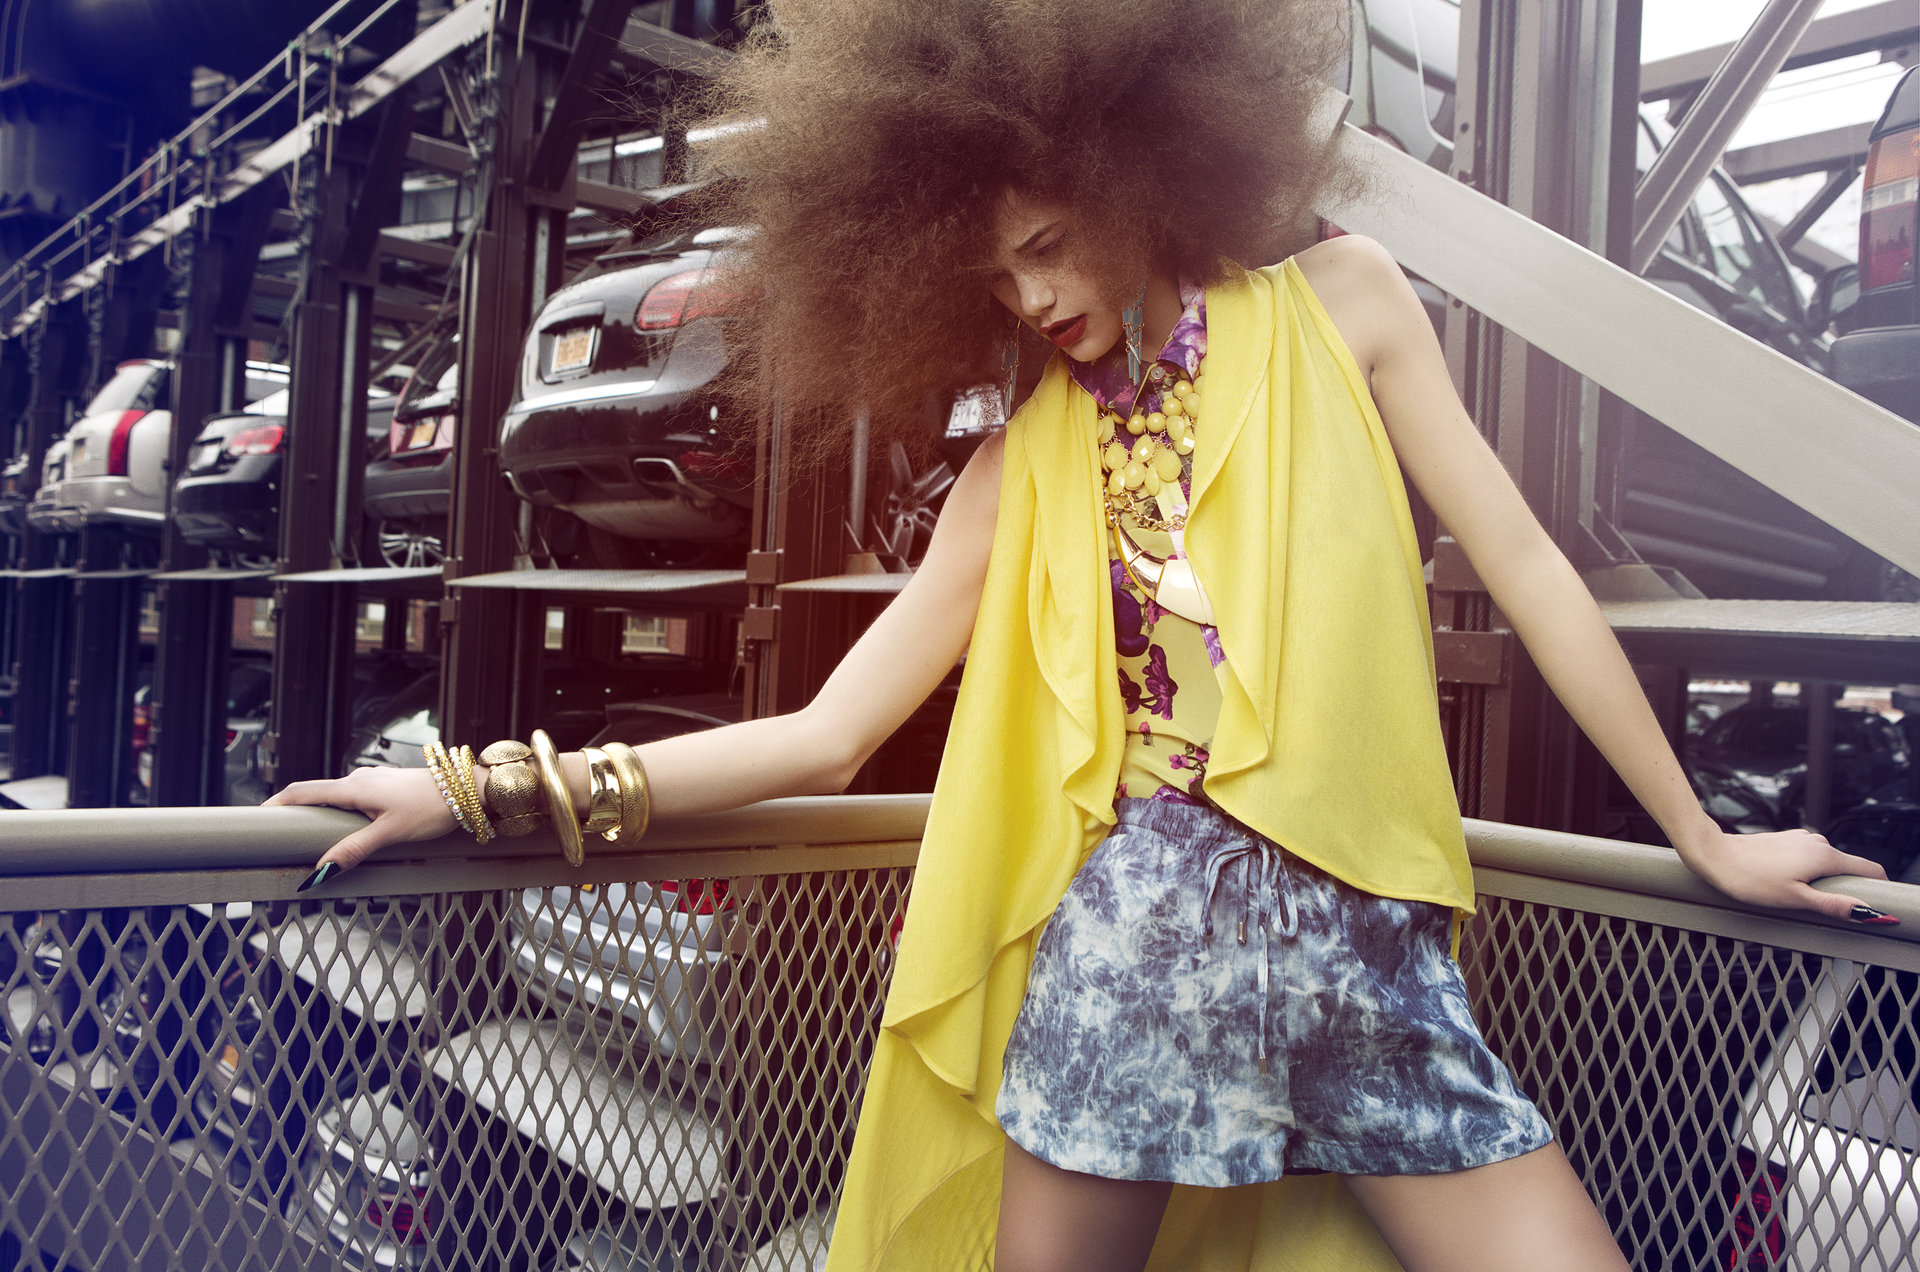 b ATTIKA MAGAZINE Hair, Makeup & Manicure: Melanie Volkart & Fabienne Pauli  Photography: Ellin Anderegg  Styling: Lili Halide-Farizi  Model: Anja Fotogen Modelmanagement AG